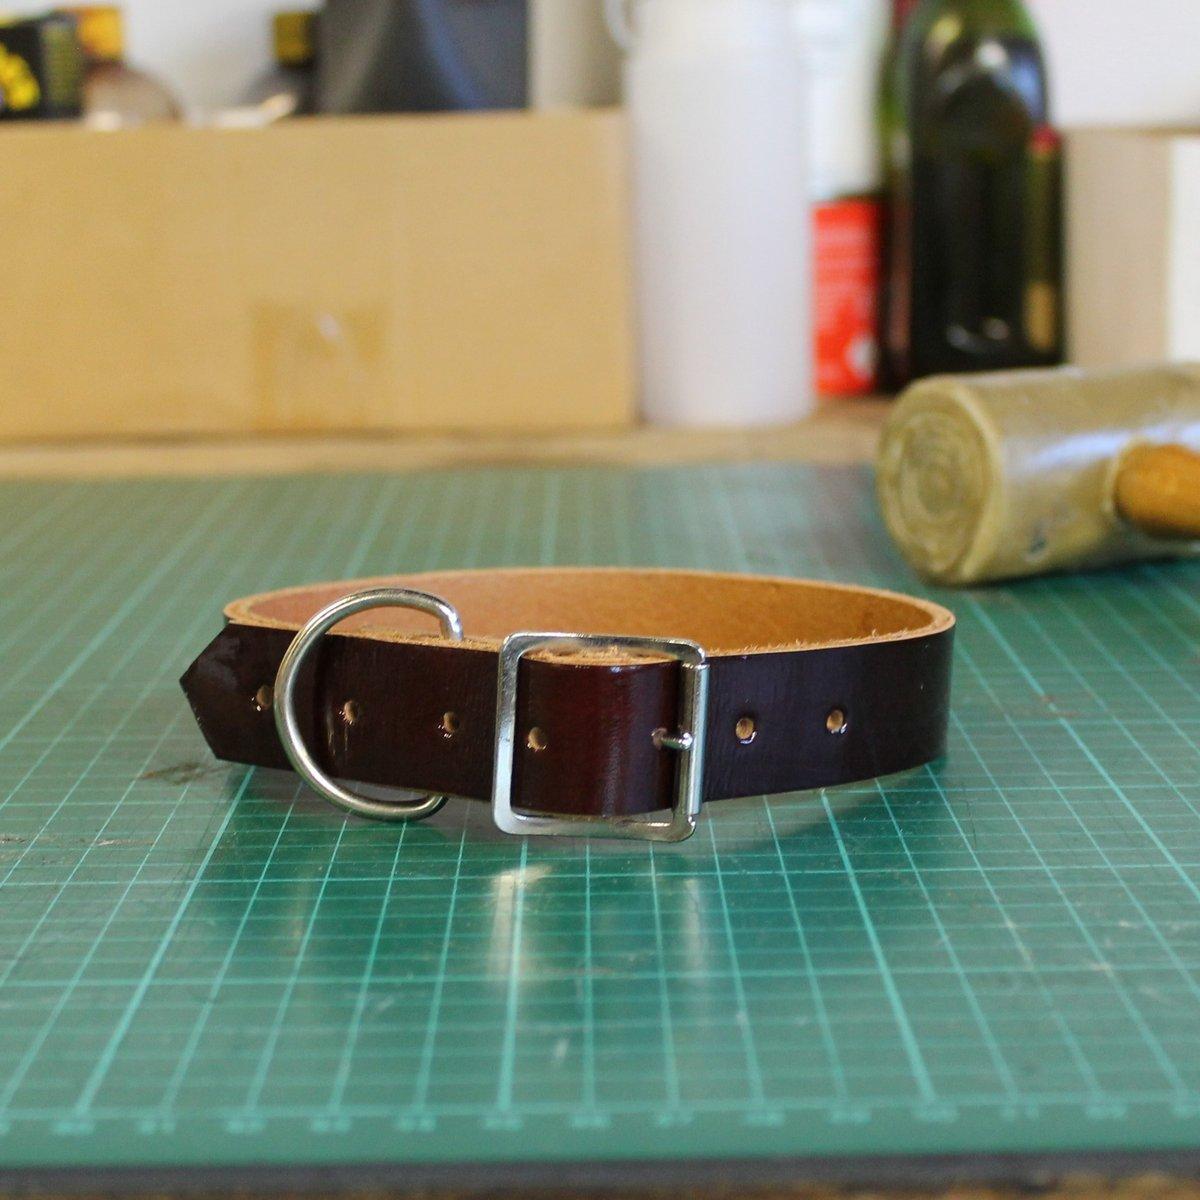 Dog Collar - Patent maroon - Small/Medium